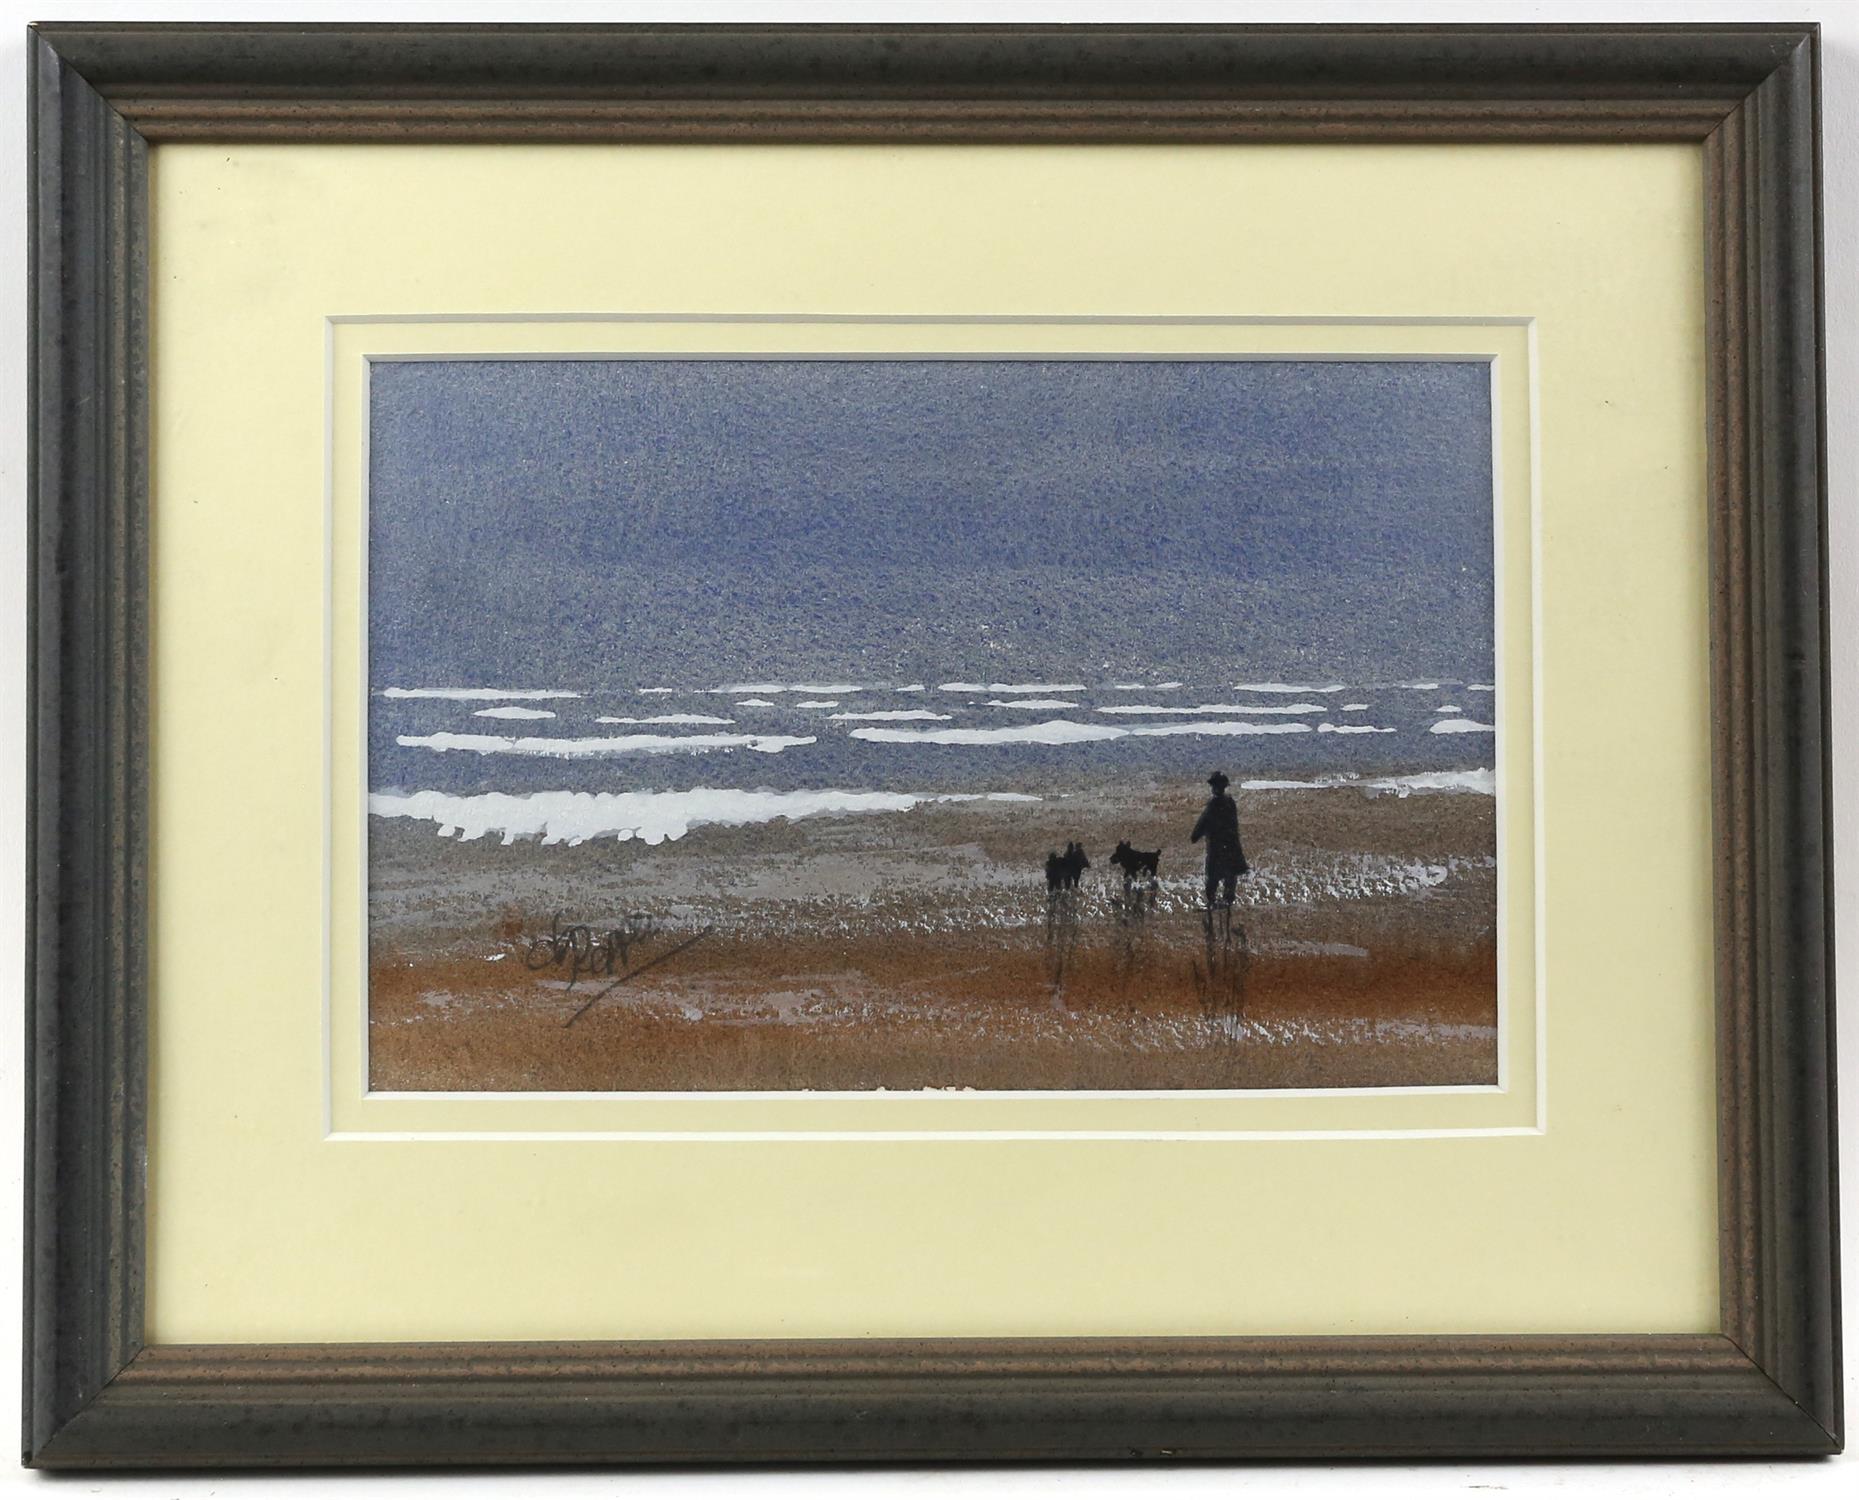 Derek Pepper, British 20th century, dog walk on the beach, signed, watercolour, 13.5cm x 21cm, - Image 2 of 4